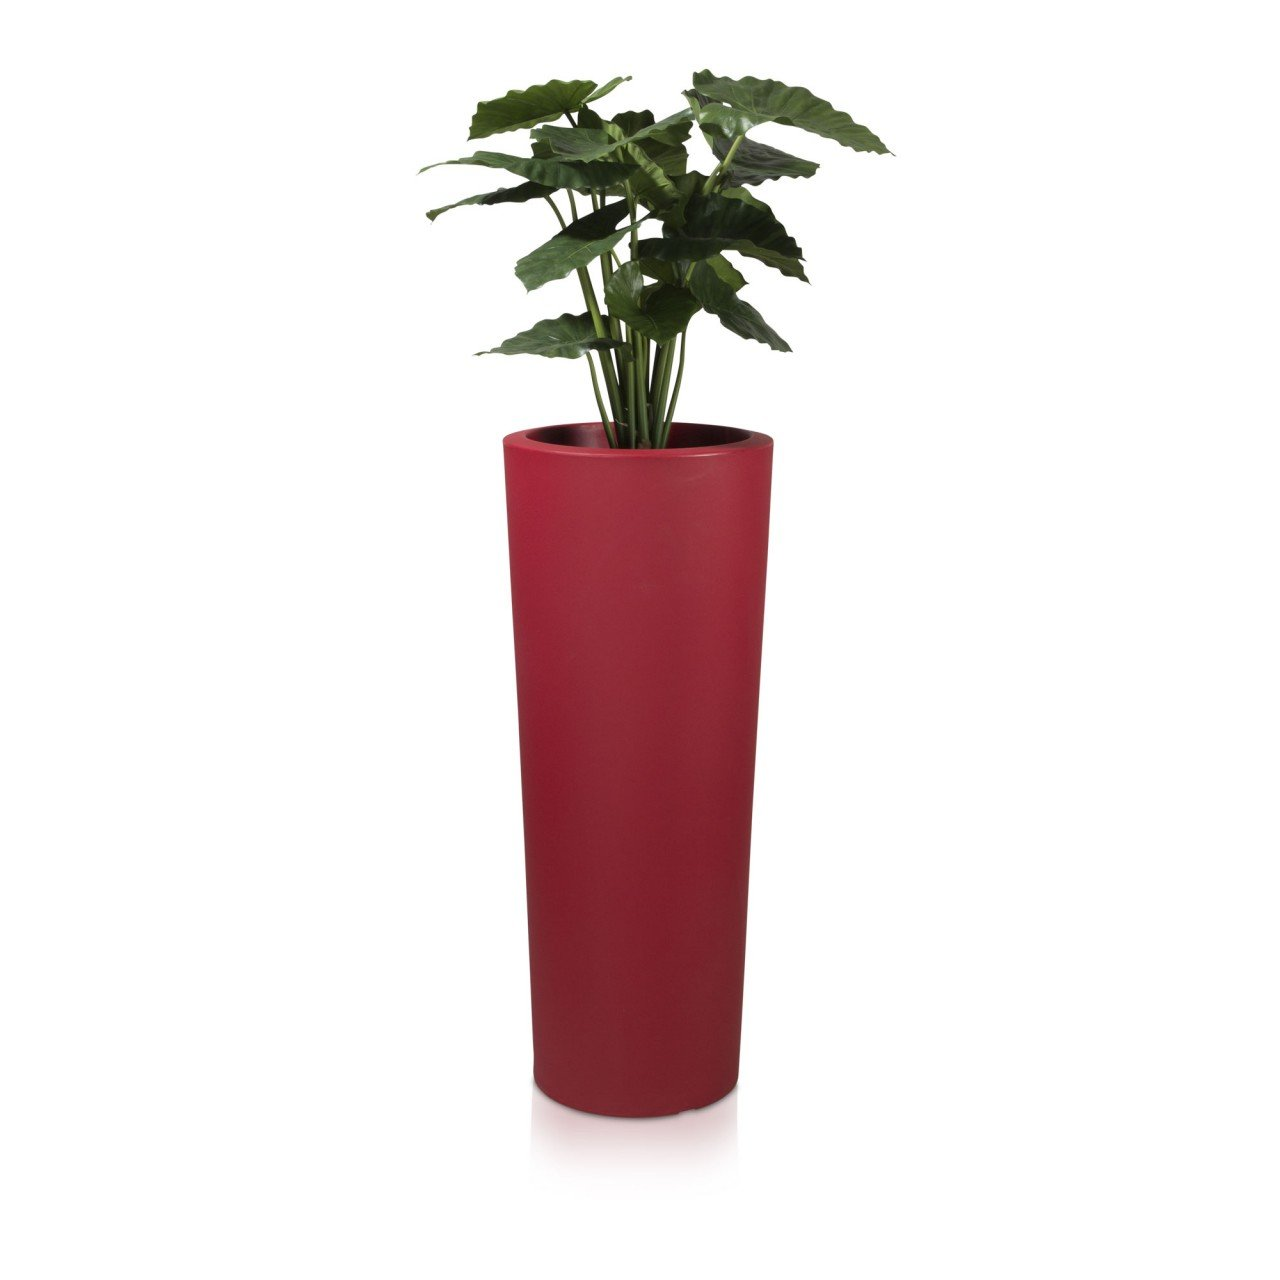 Pflanzkübel Blumenkübel CONO 110 Kunststoff, 45x45x110 cm, rot matt